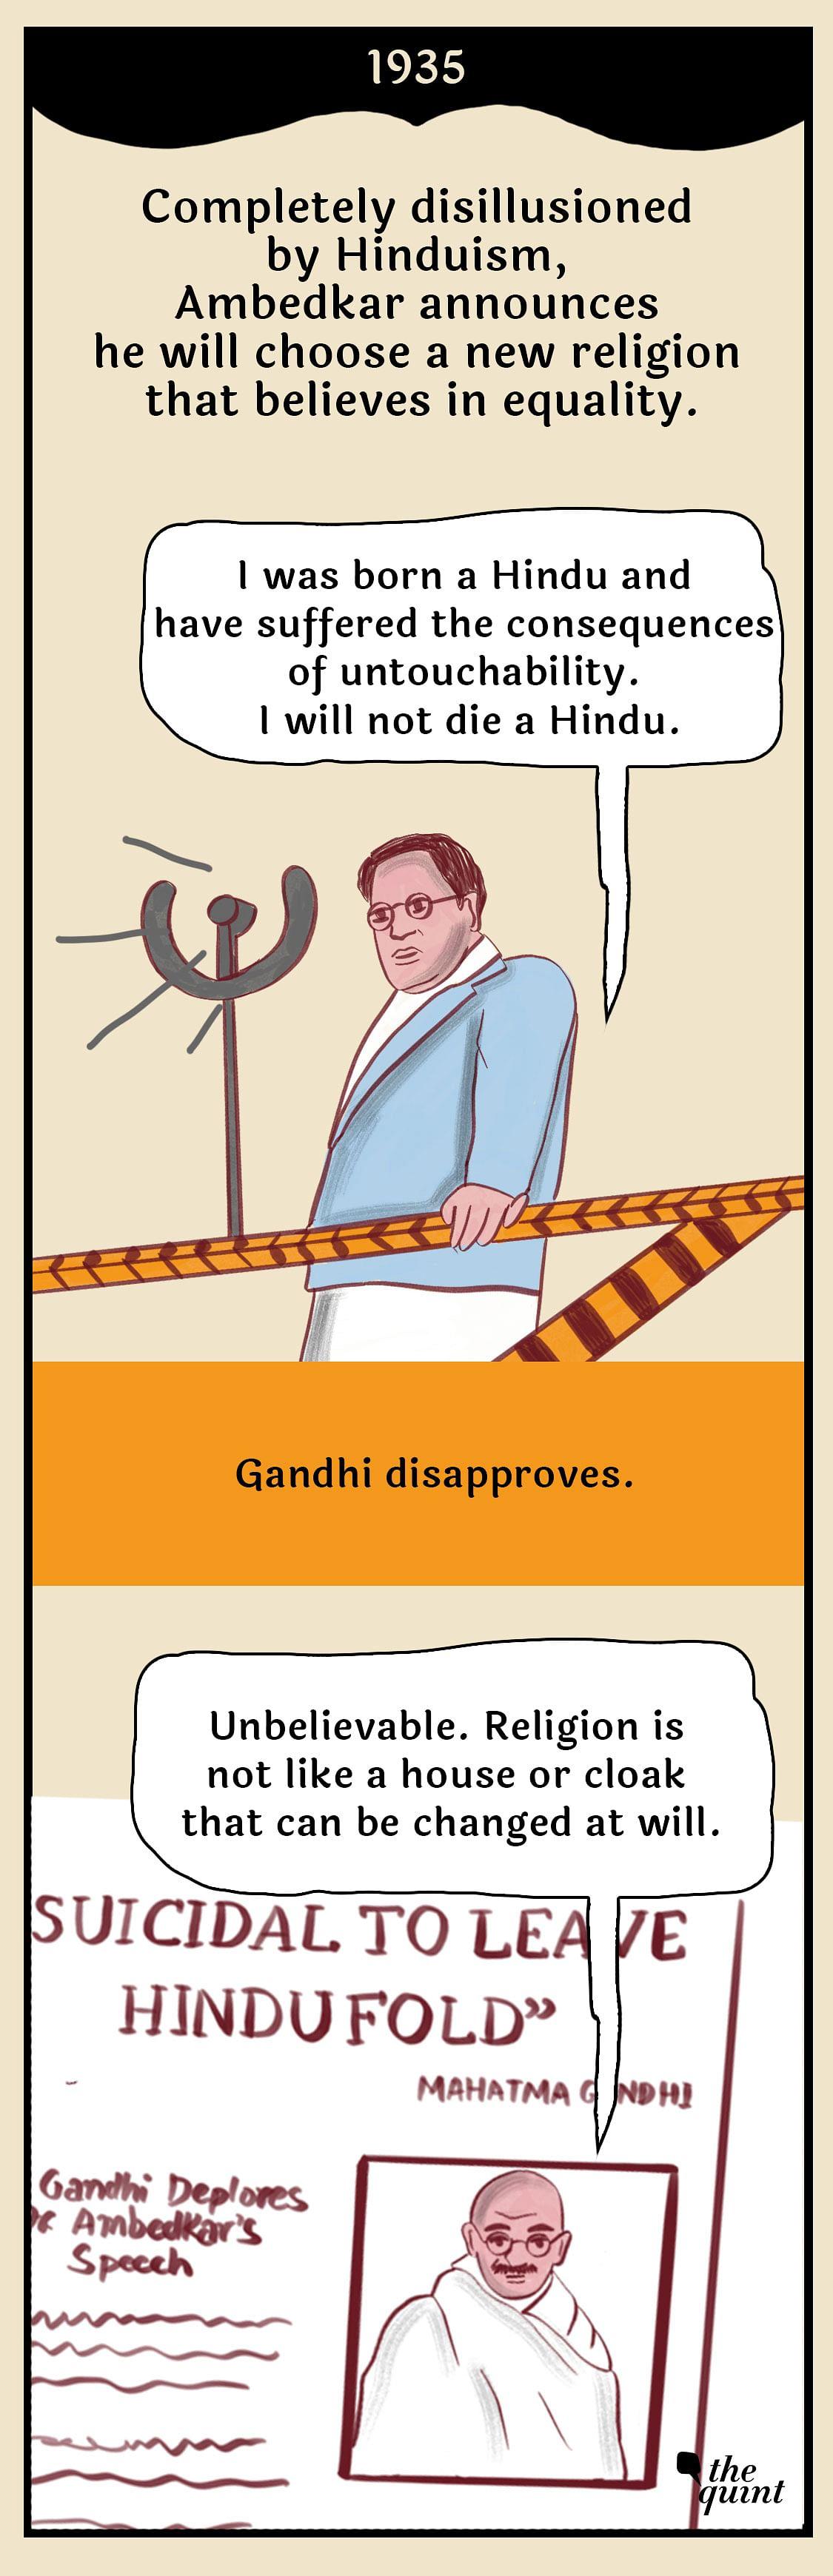 Graphic Novel:  Ambedkar's Discord With Gandhi Over Untouchability